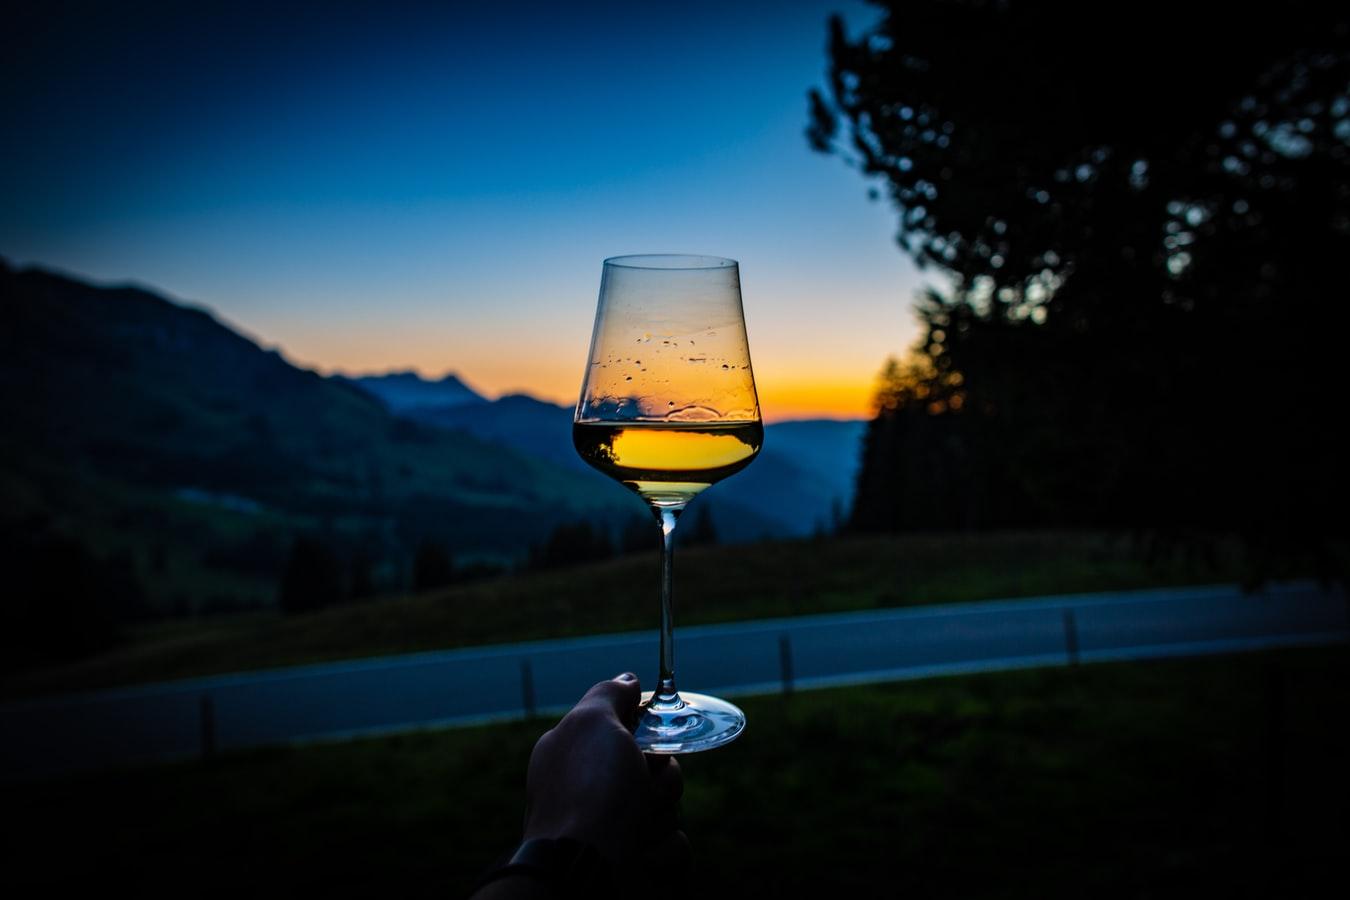 wine-glass-sun-evening